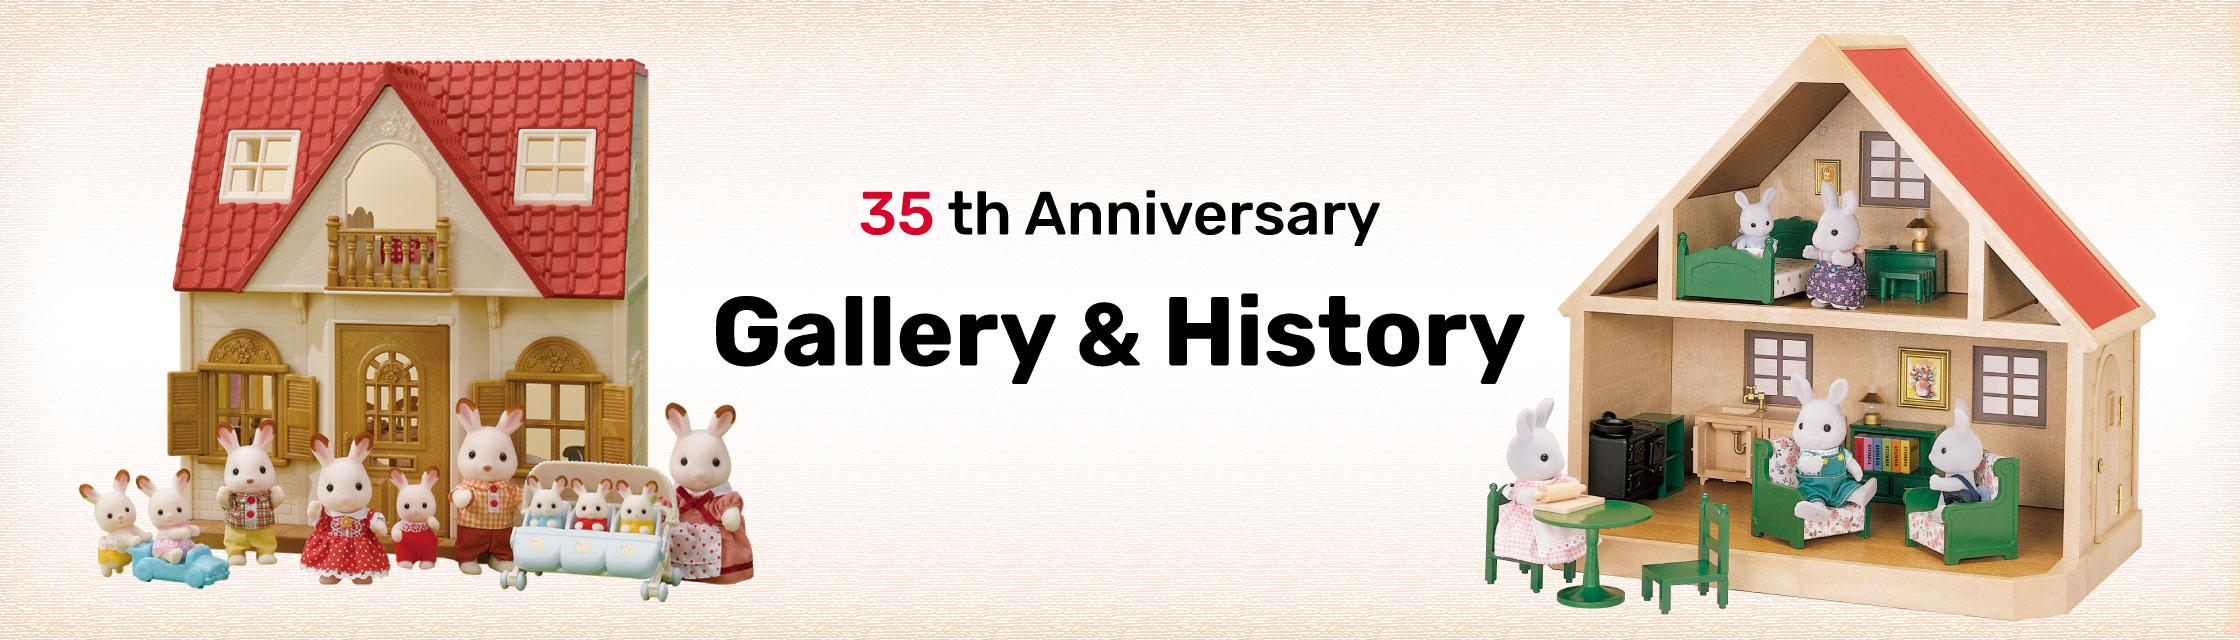 Gallery & History